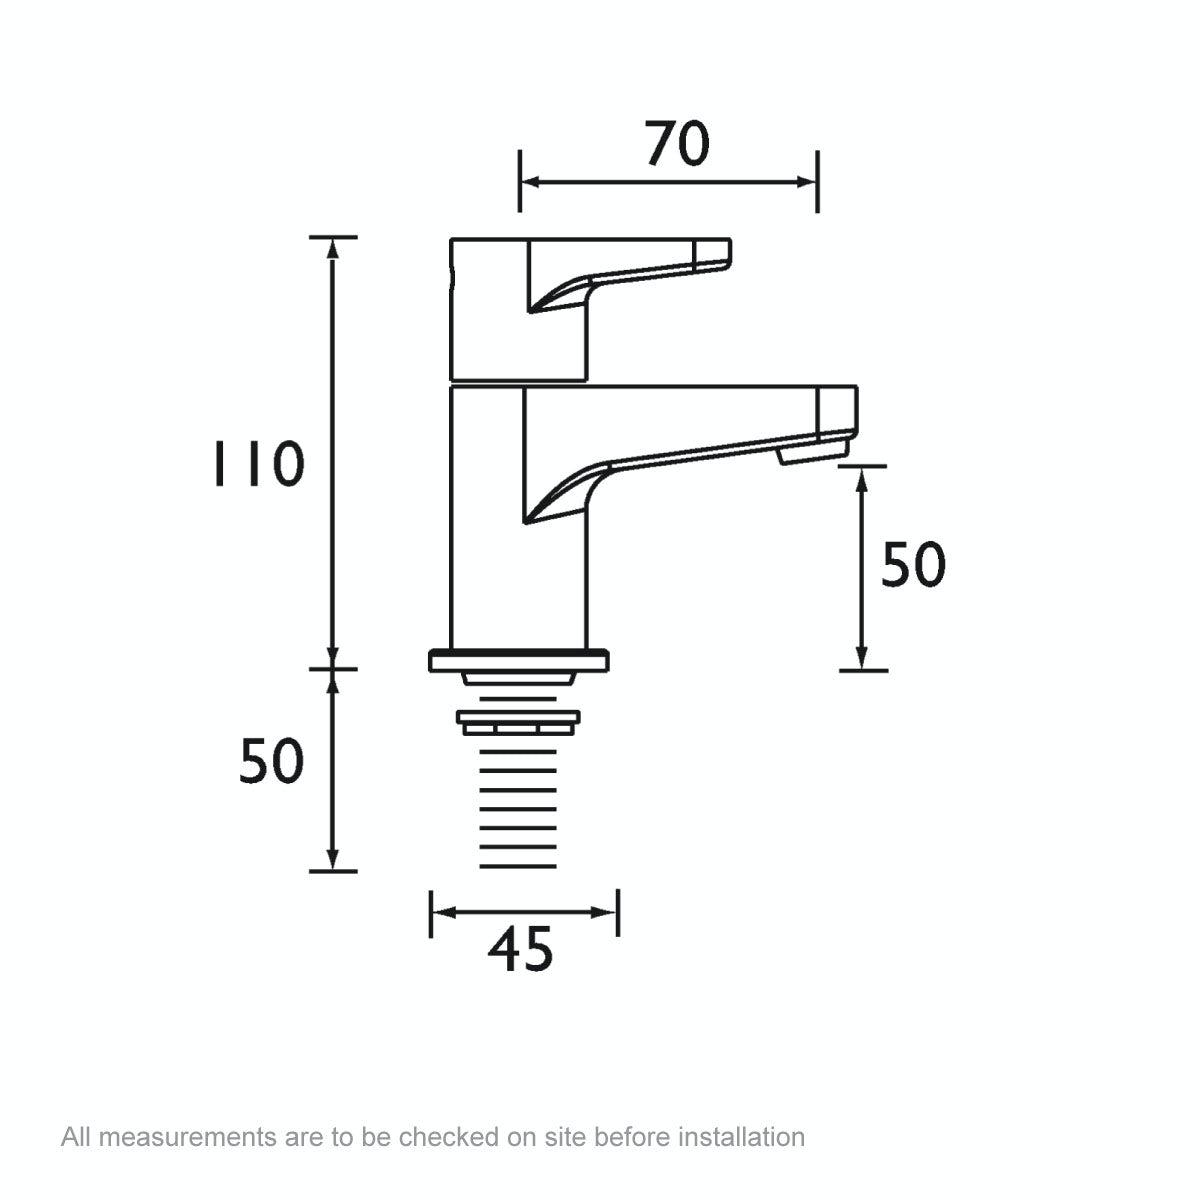 Dimensions for Bristan Quest basin taps